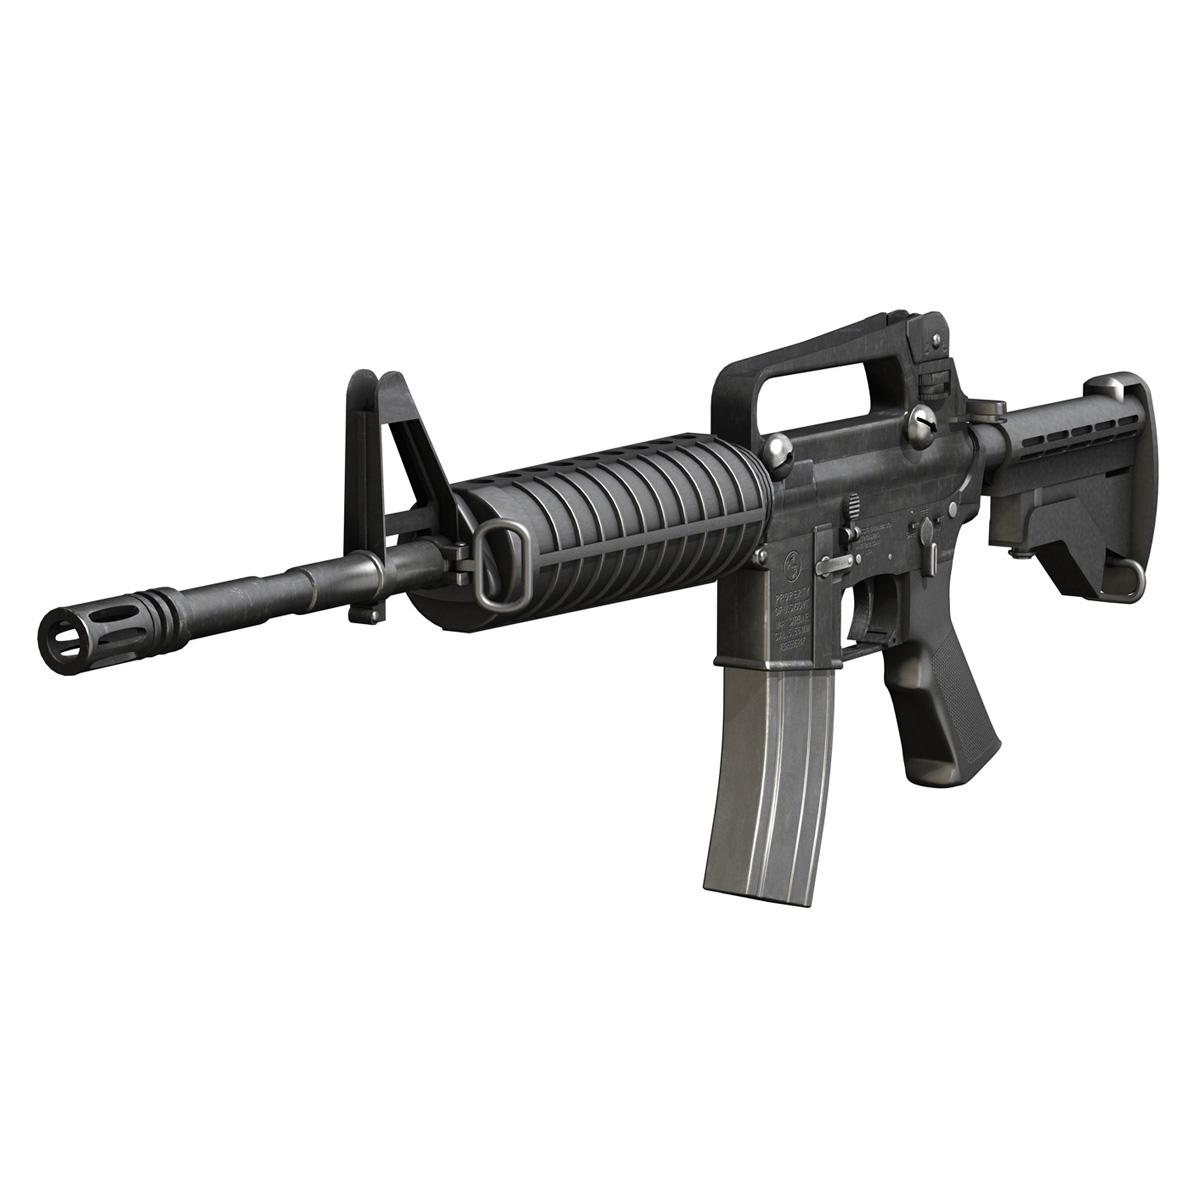 colt m4a1 carbine довтолгооны буу 3d загвар 3ds fbx c4d lwo obj 187786